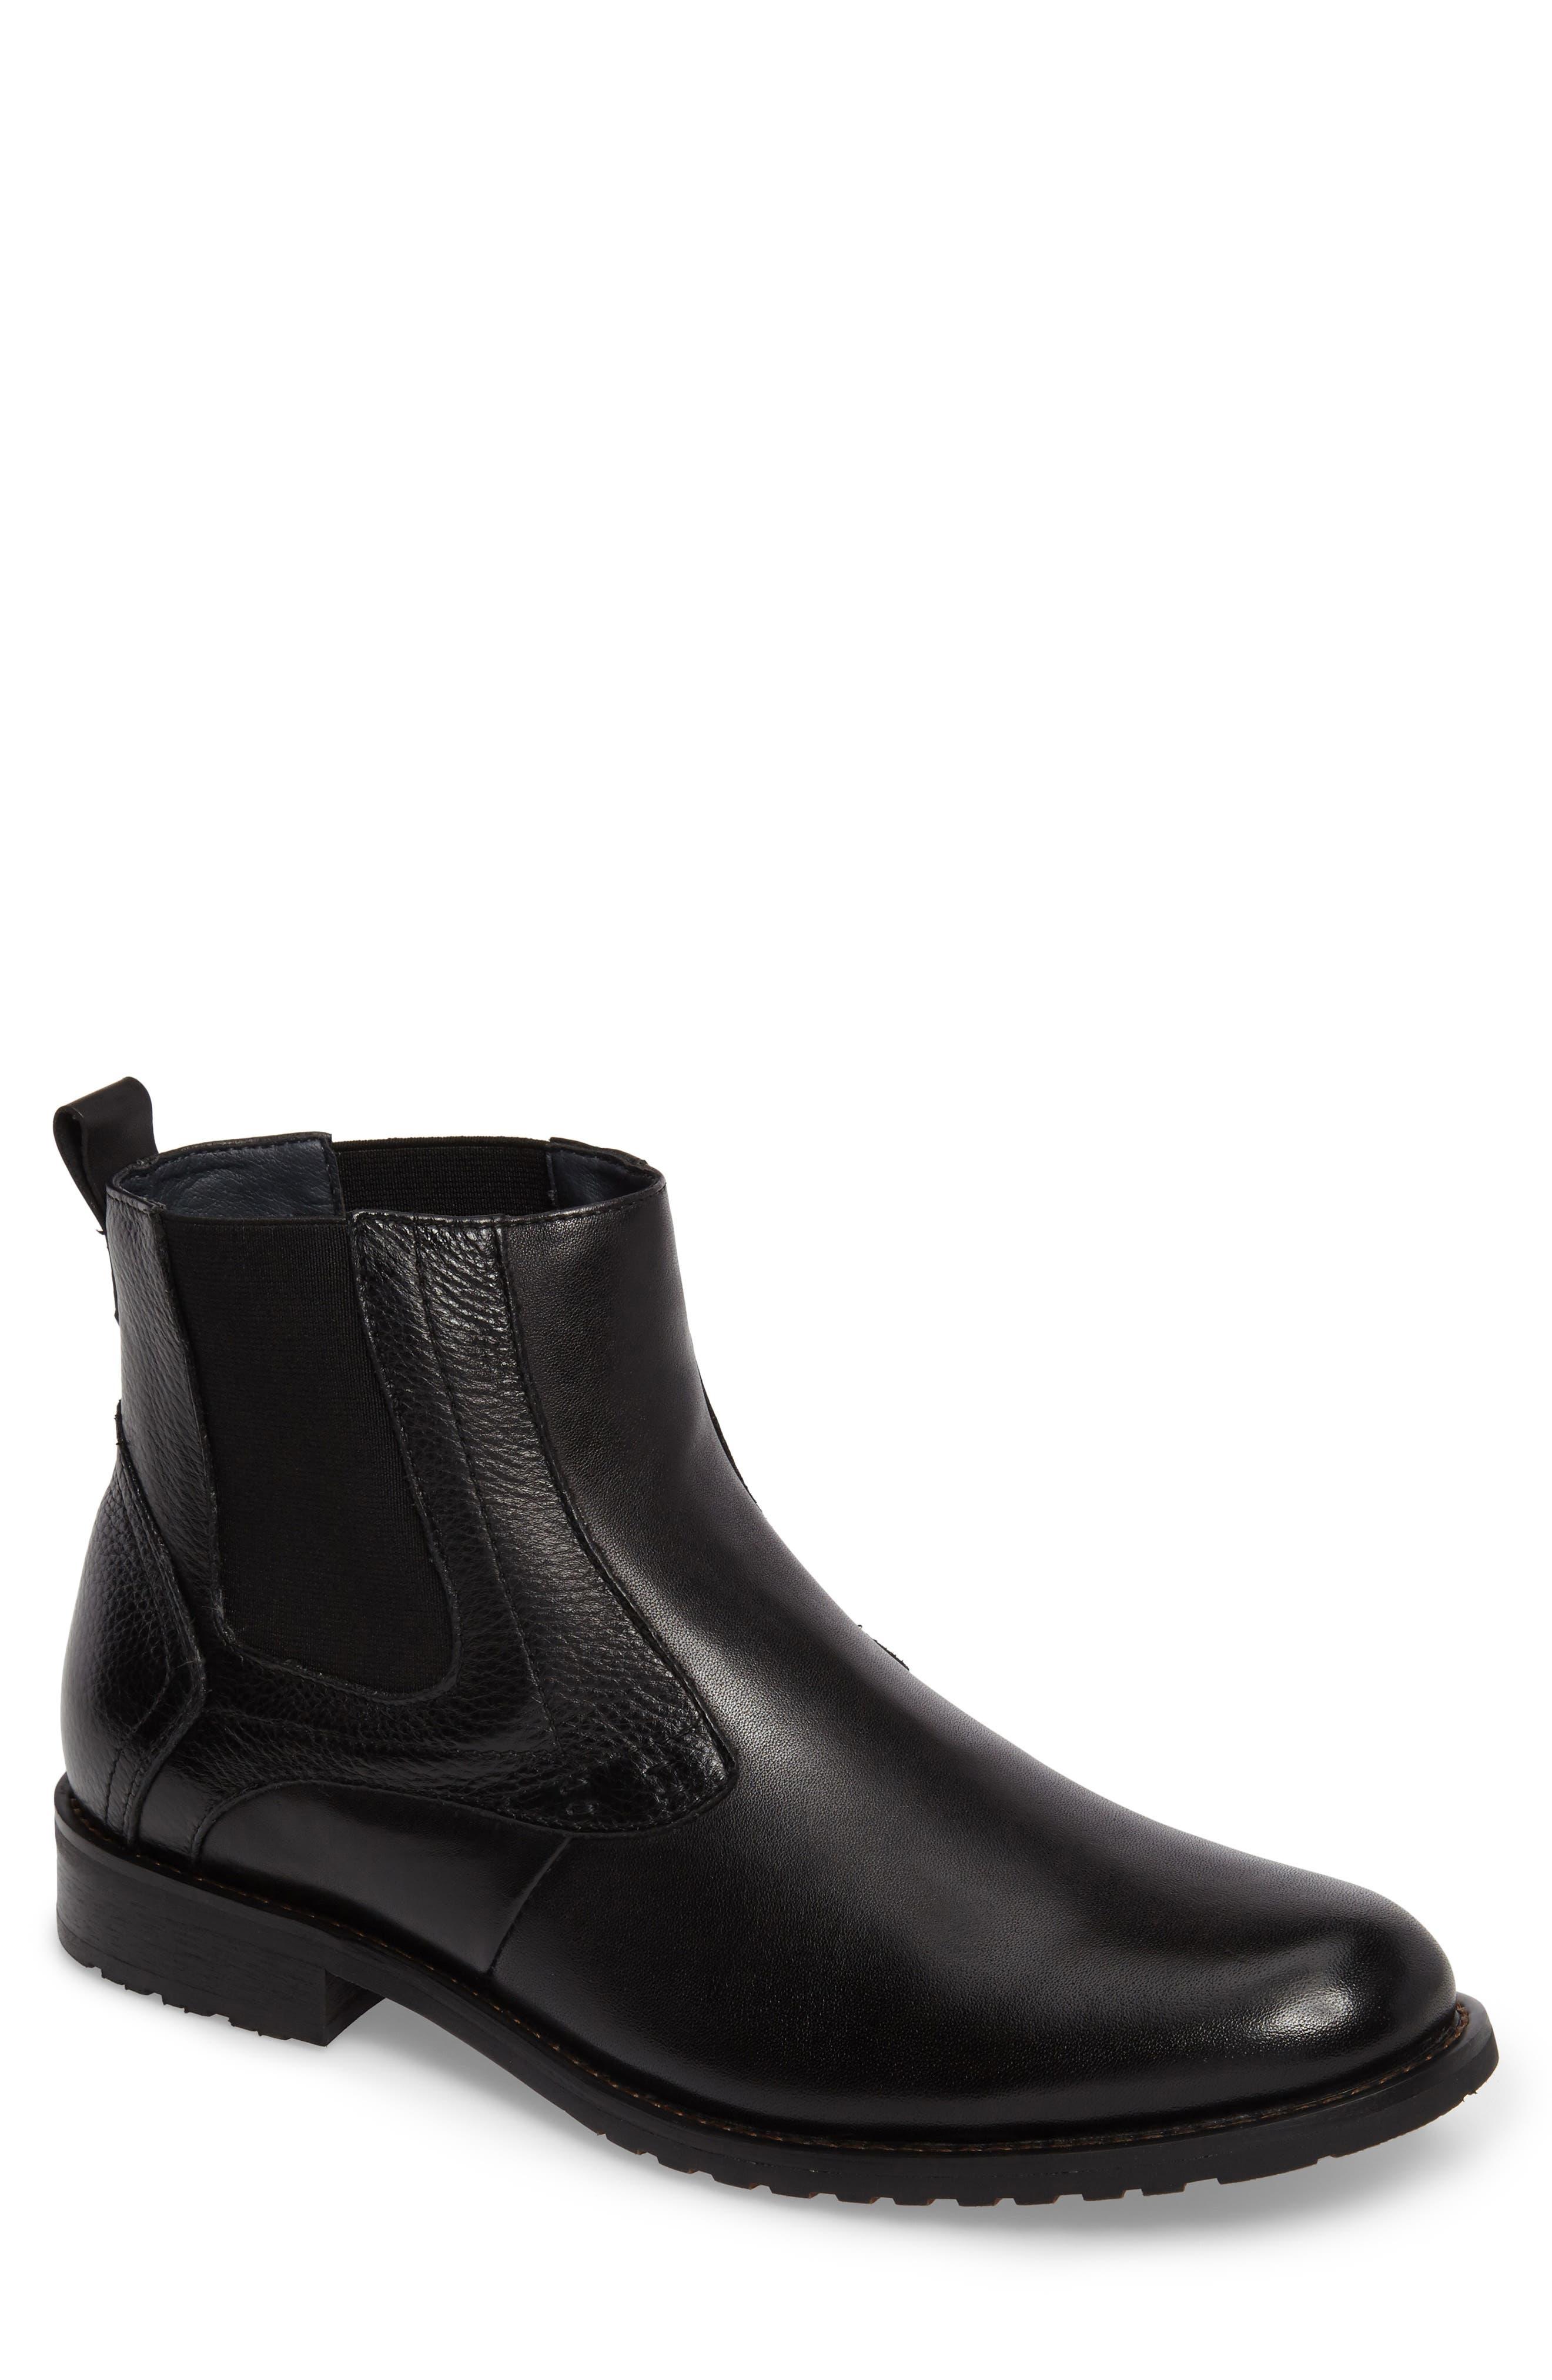 Oaks Chelsea Boot,                             Main thumbnail 1, color,                             Black Leather